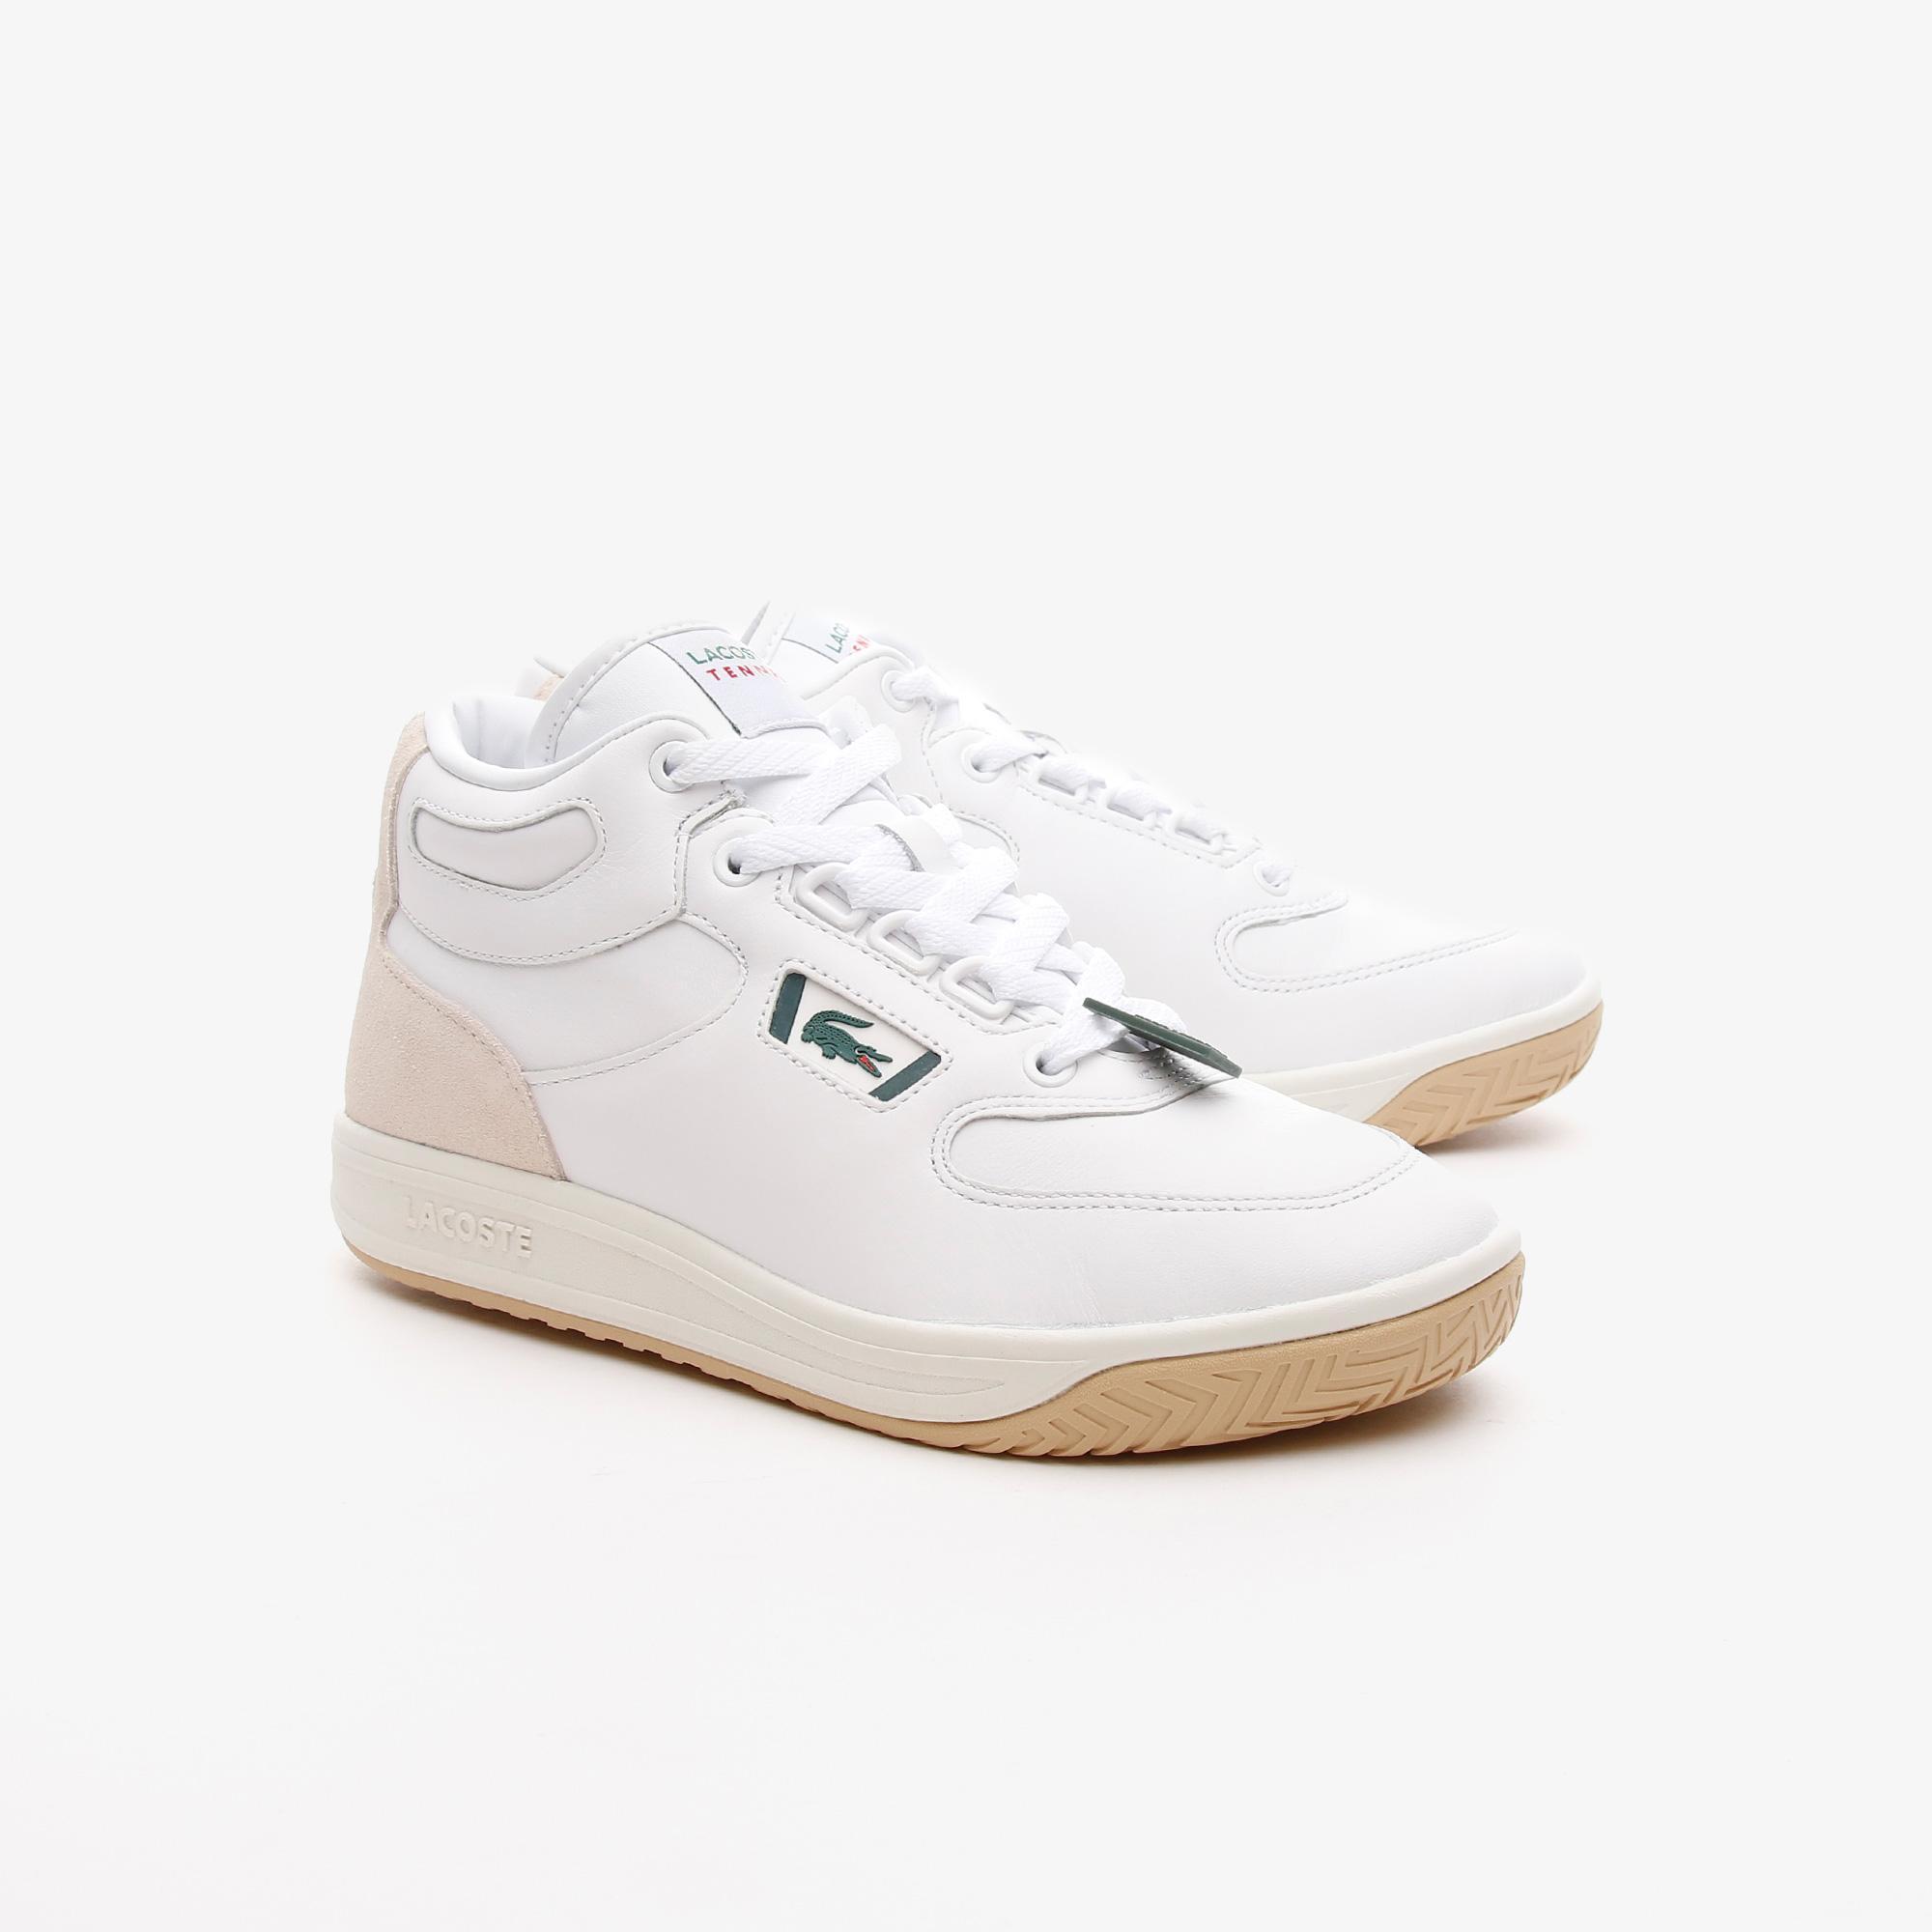 Lacoste Balsa 0721 1 Sma Erkek Beyaz - Koyu Yeşil Sneaker